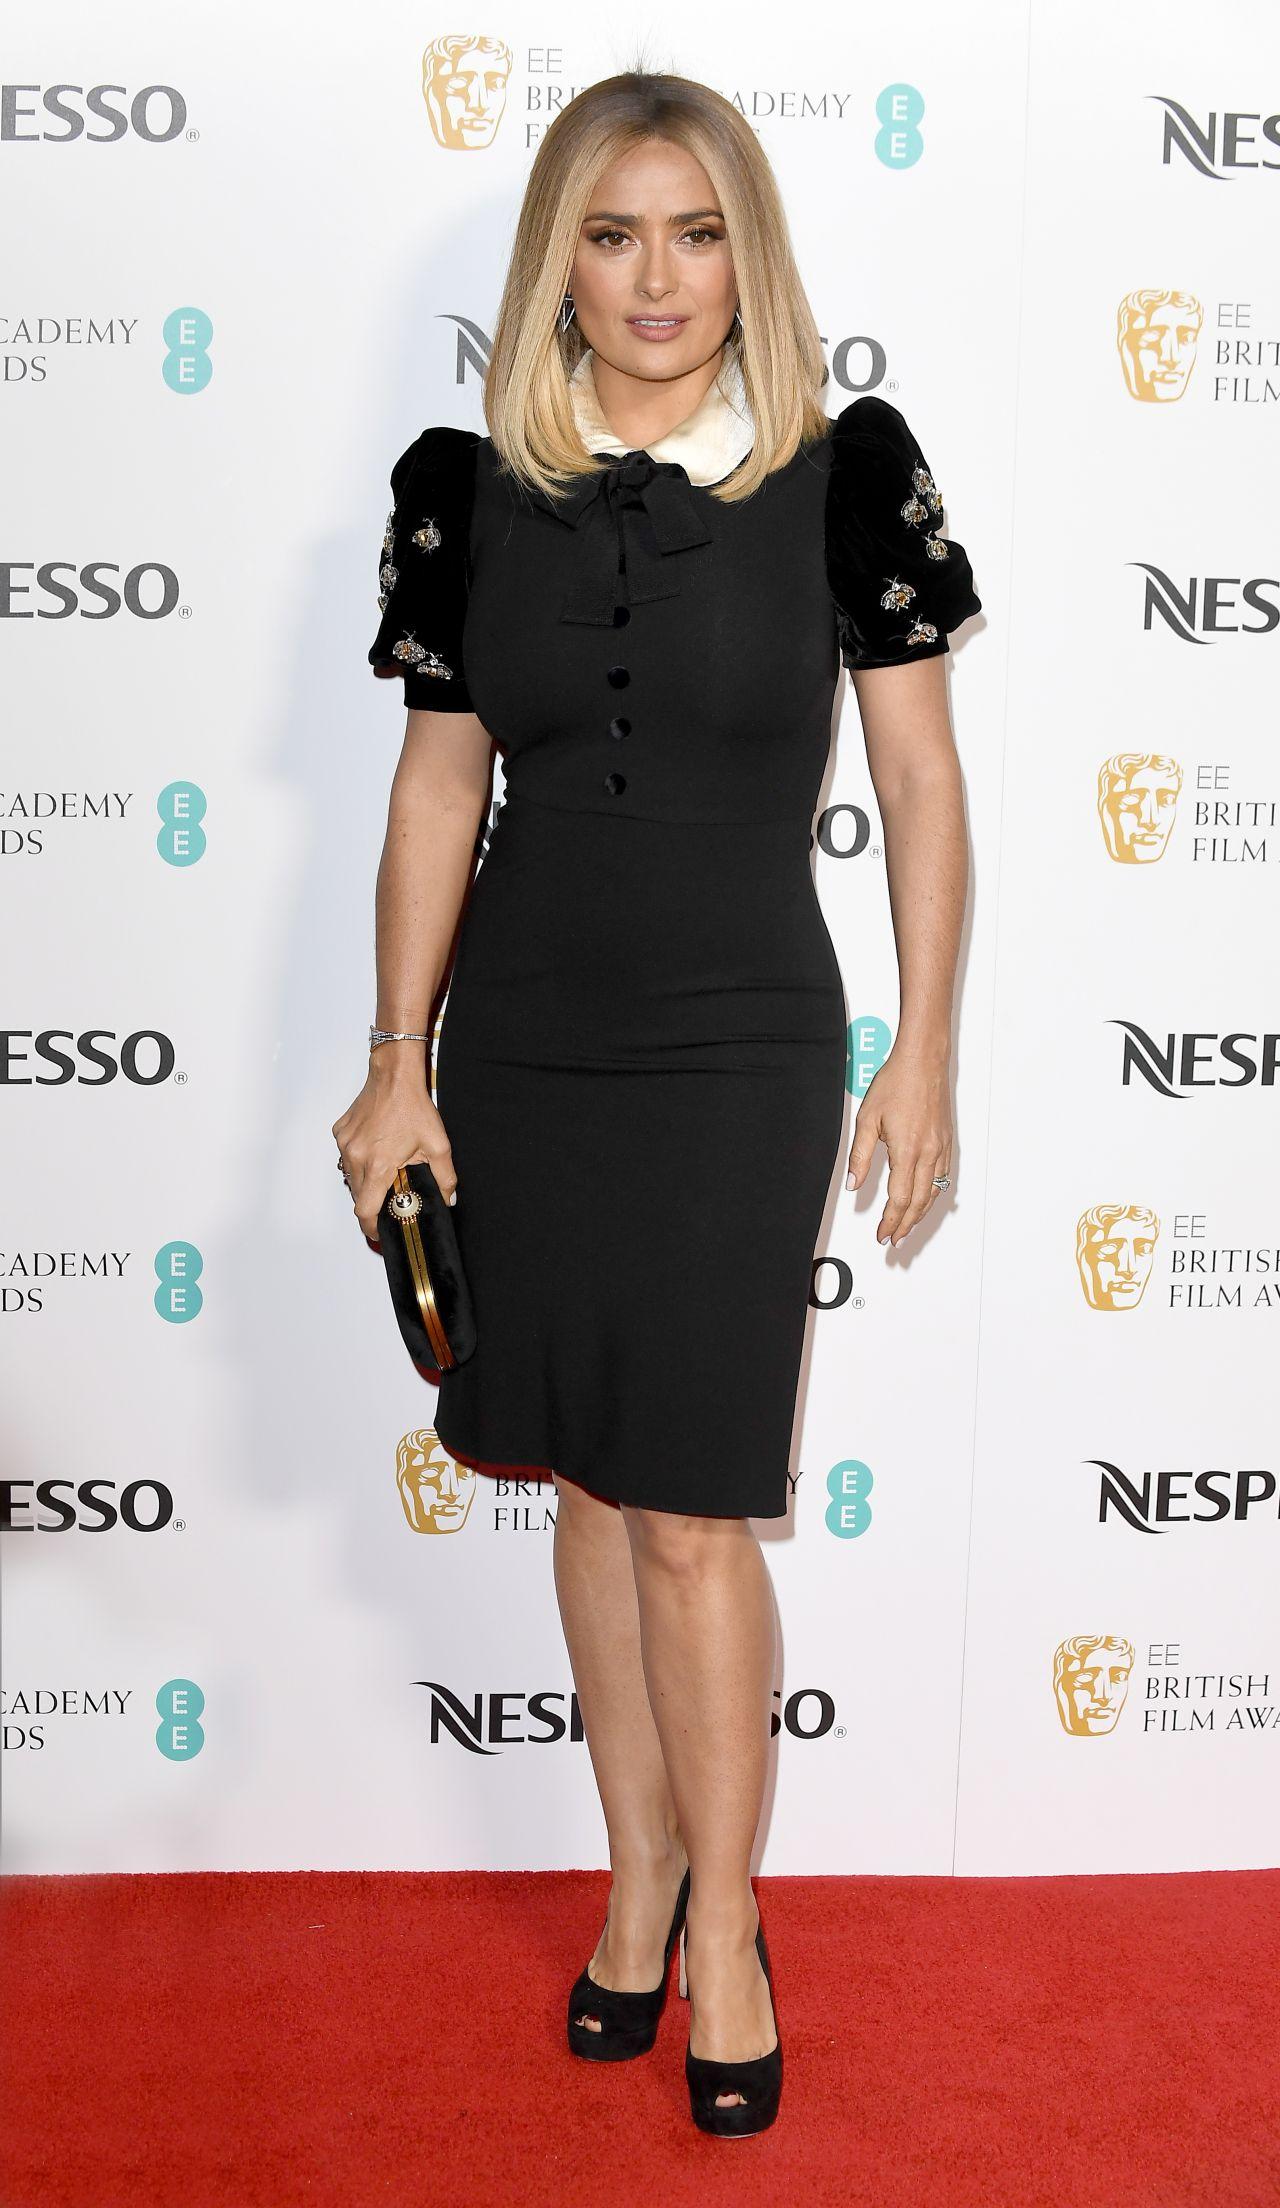 http://celebmafia.com/wp-content/uploads/2018/02/salma-hayek-british-academy-film-awards-nominees-party-in-london-12.jpg